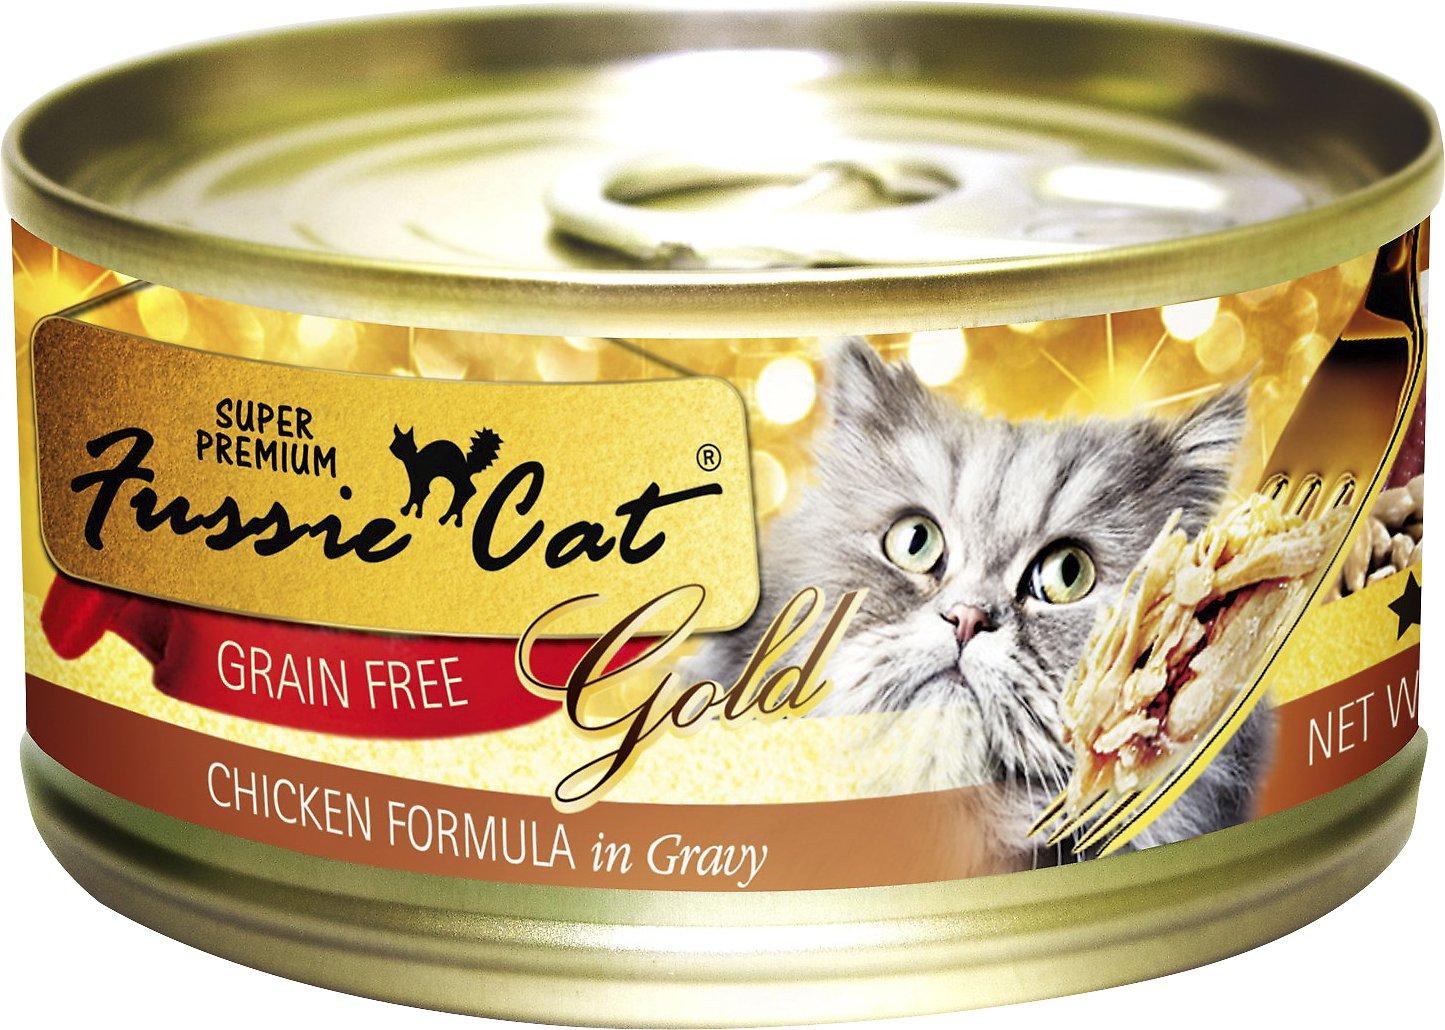 Fussie Cat Super Premium Chicken Formula in Gravy Grain-Free Canned Cat Food, 5.5-oz